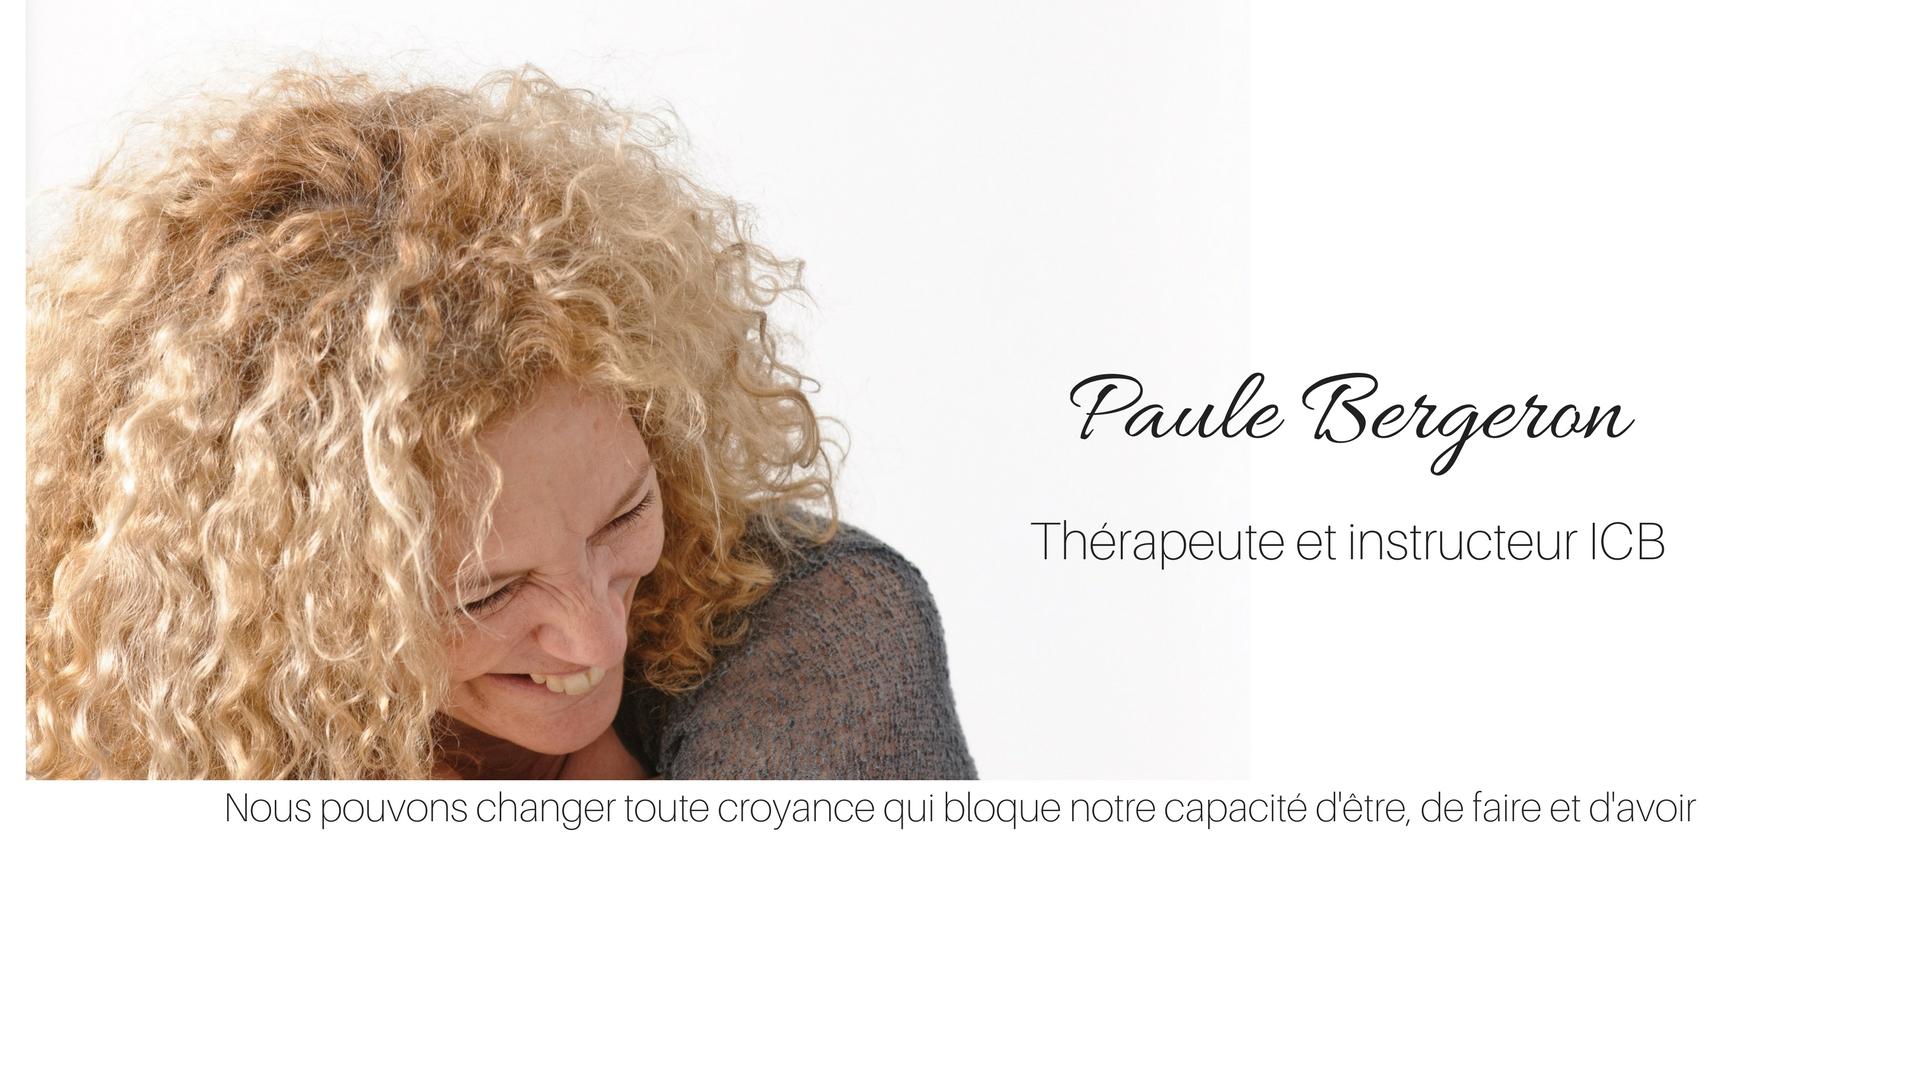 Paule Bergeron - thérapeute praticienne ICB